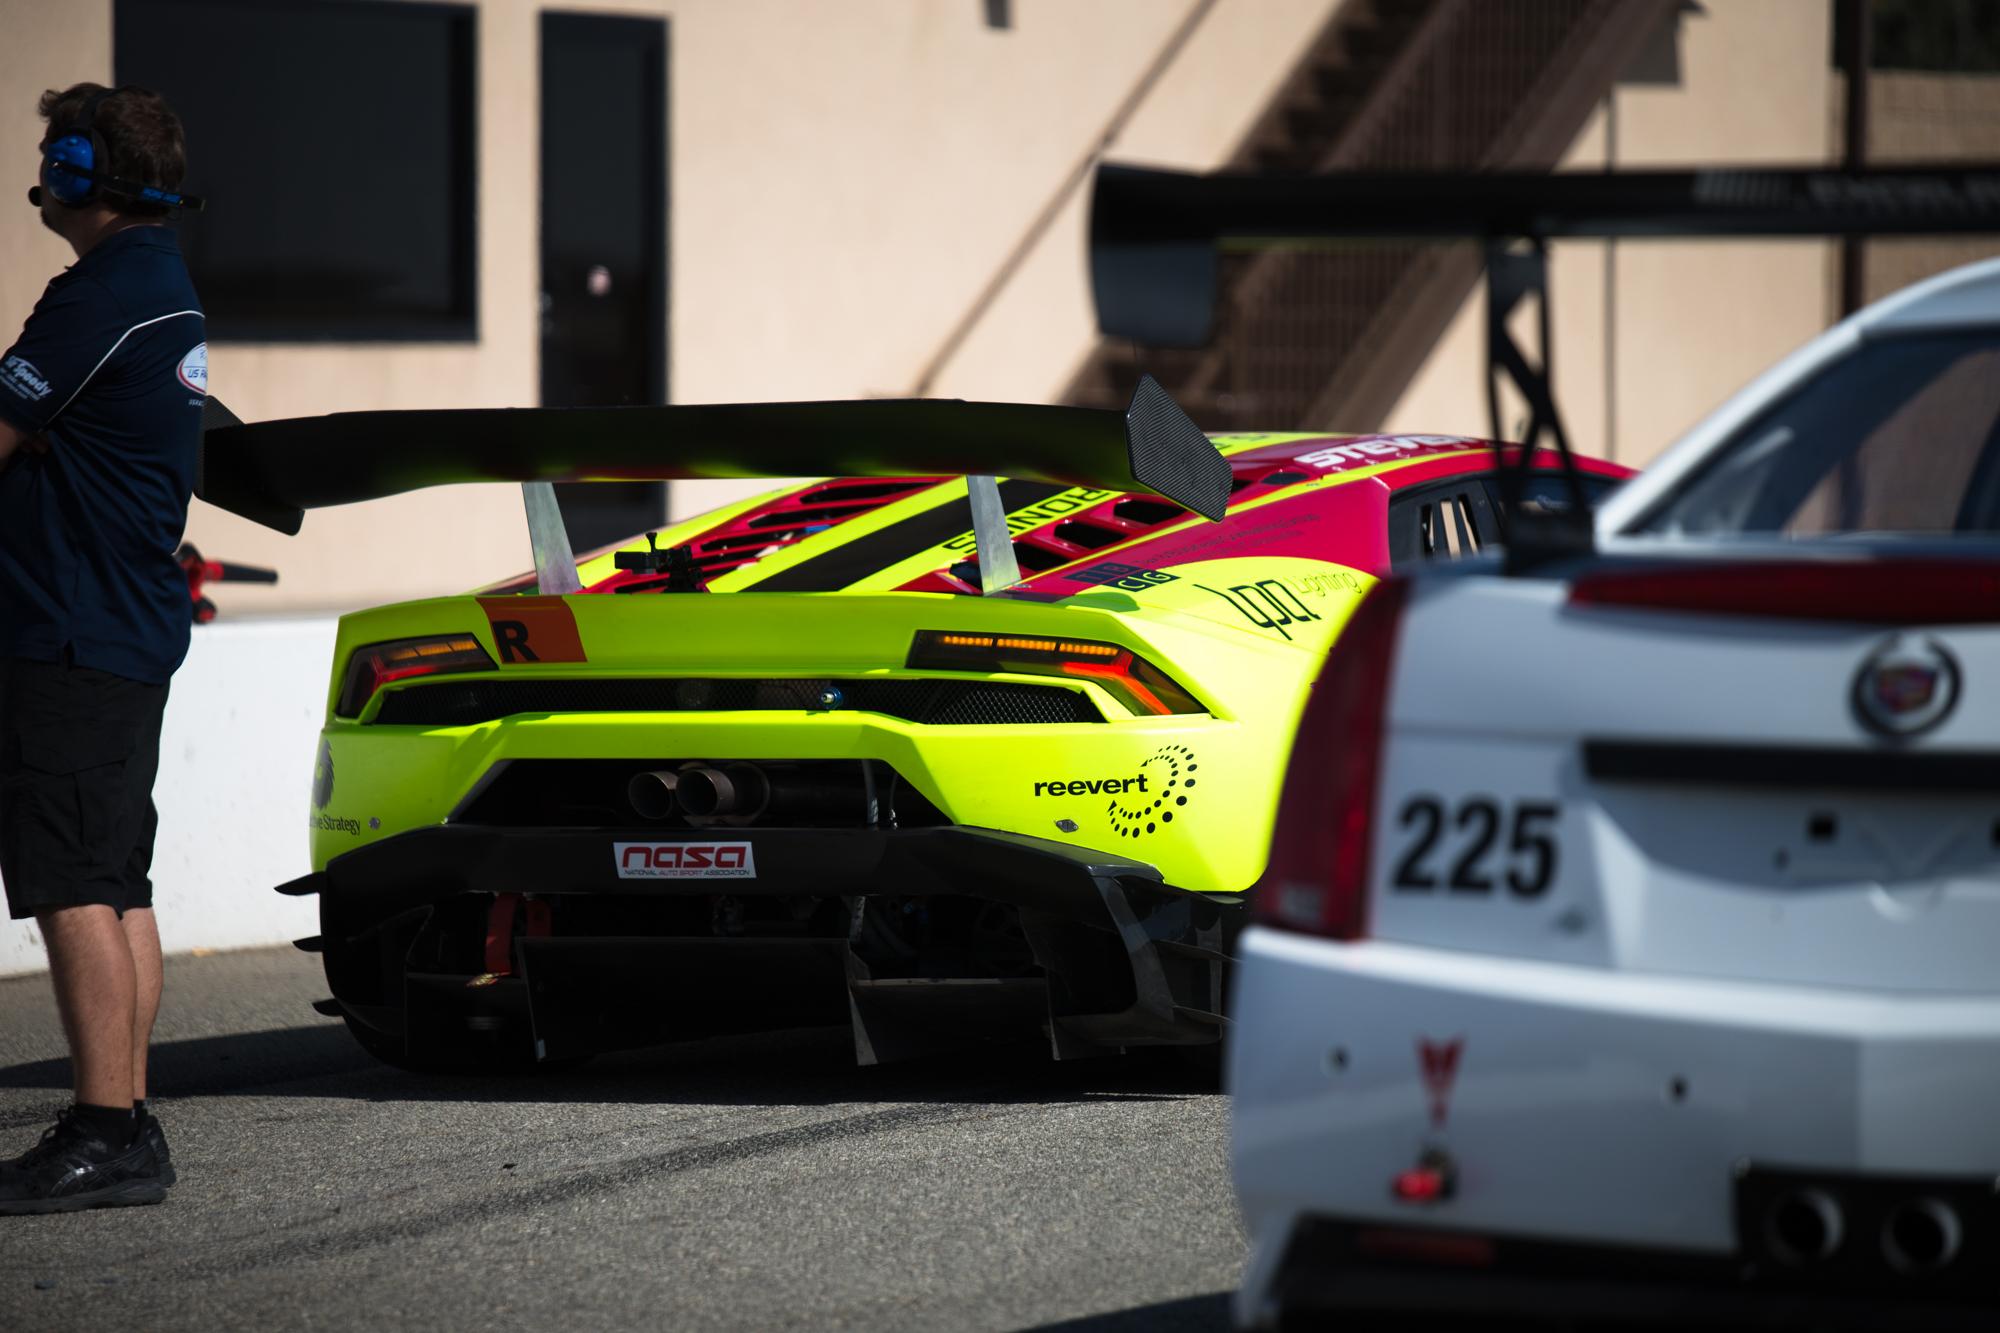 Steven-Racing-20171027-53663.jpg